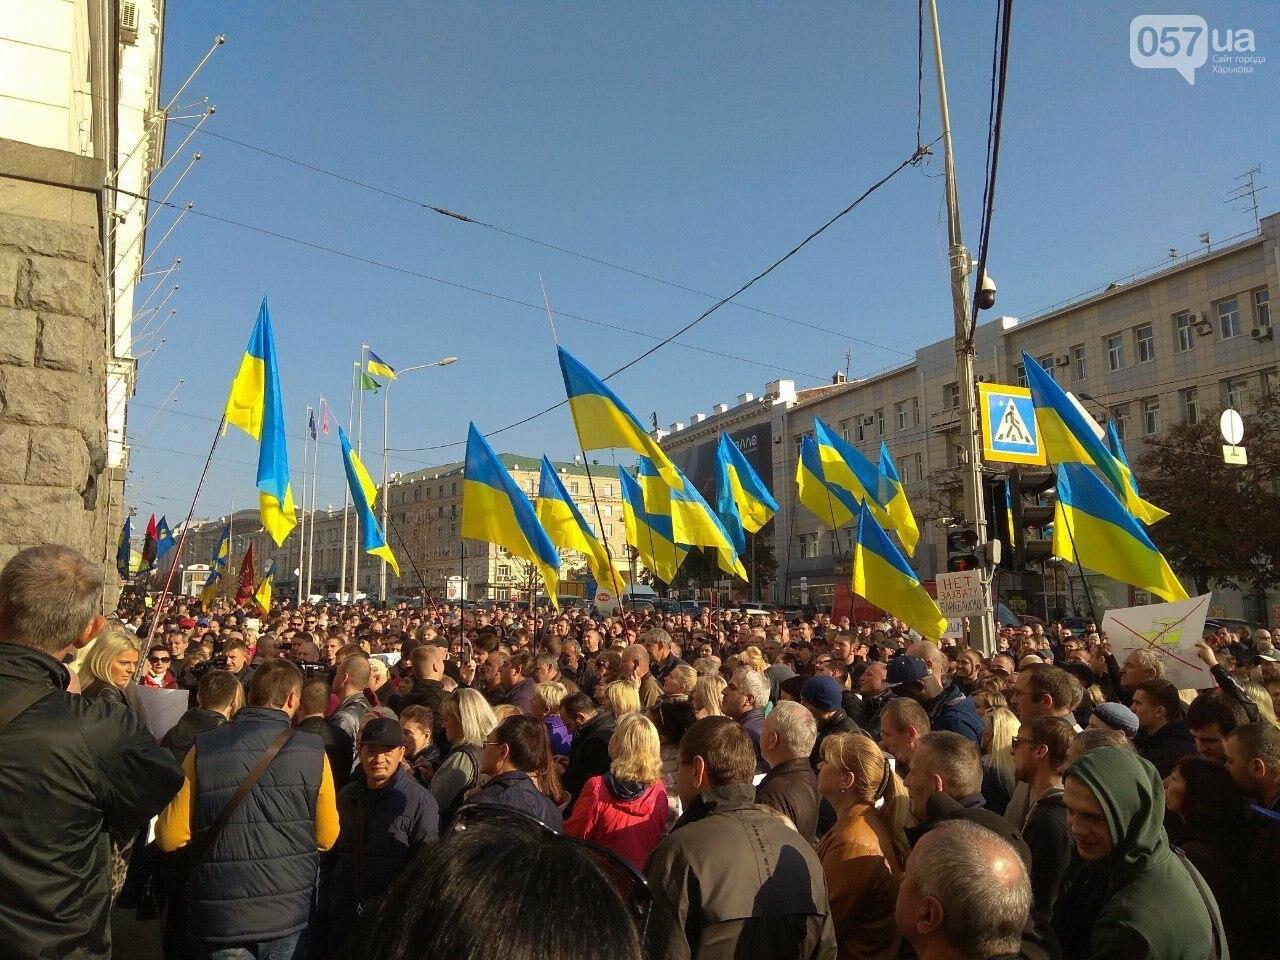 «Нам дорога не нужна»: предприниматели «Барабашово» пикетируют горсовет, - ФОТО, фото-7